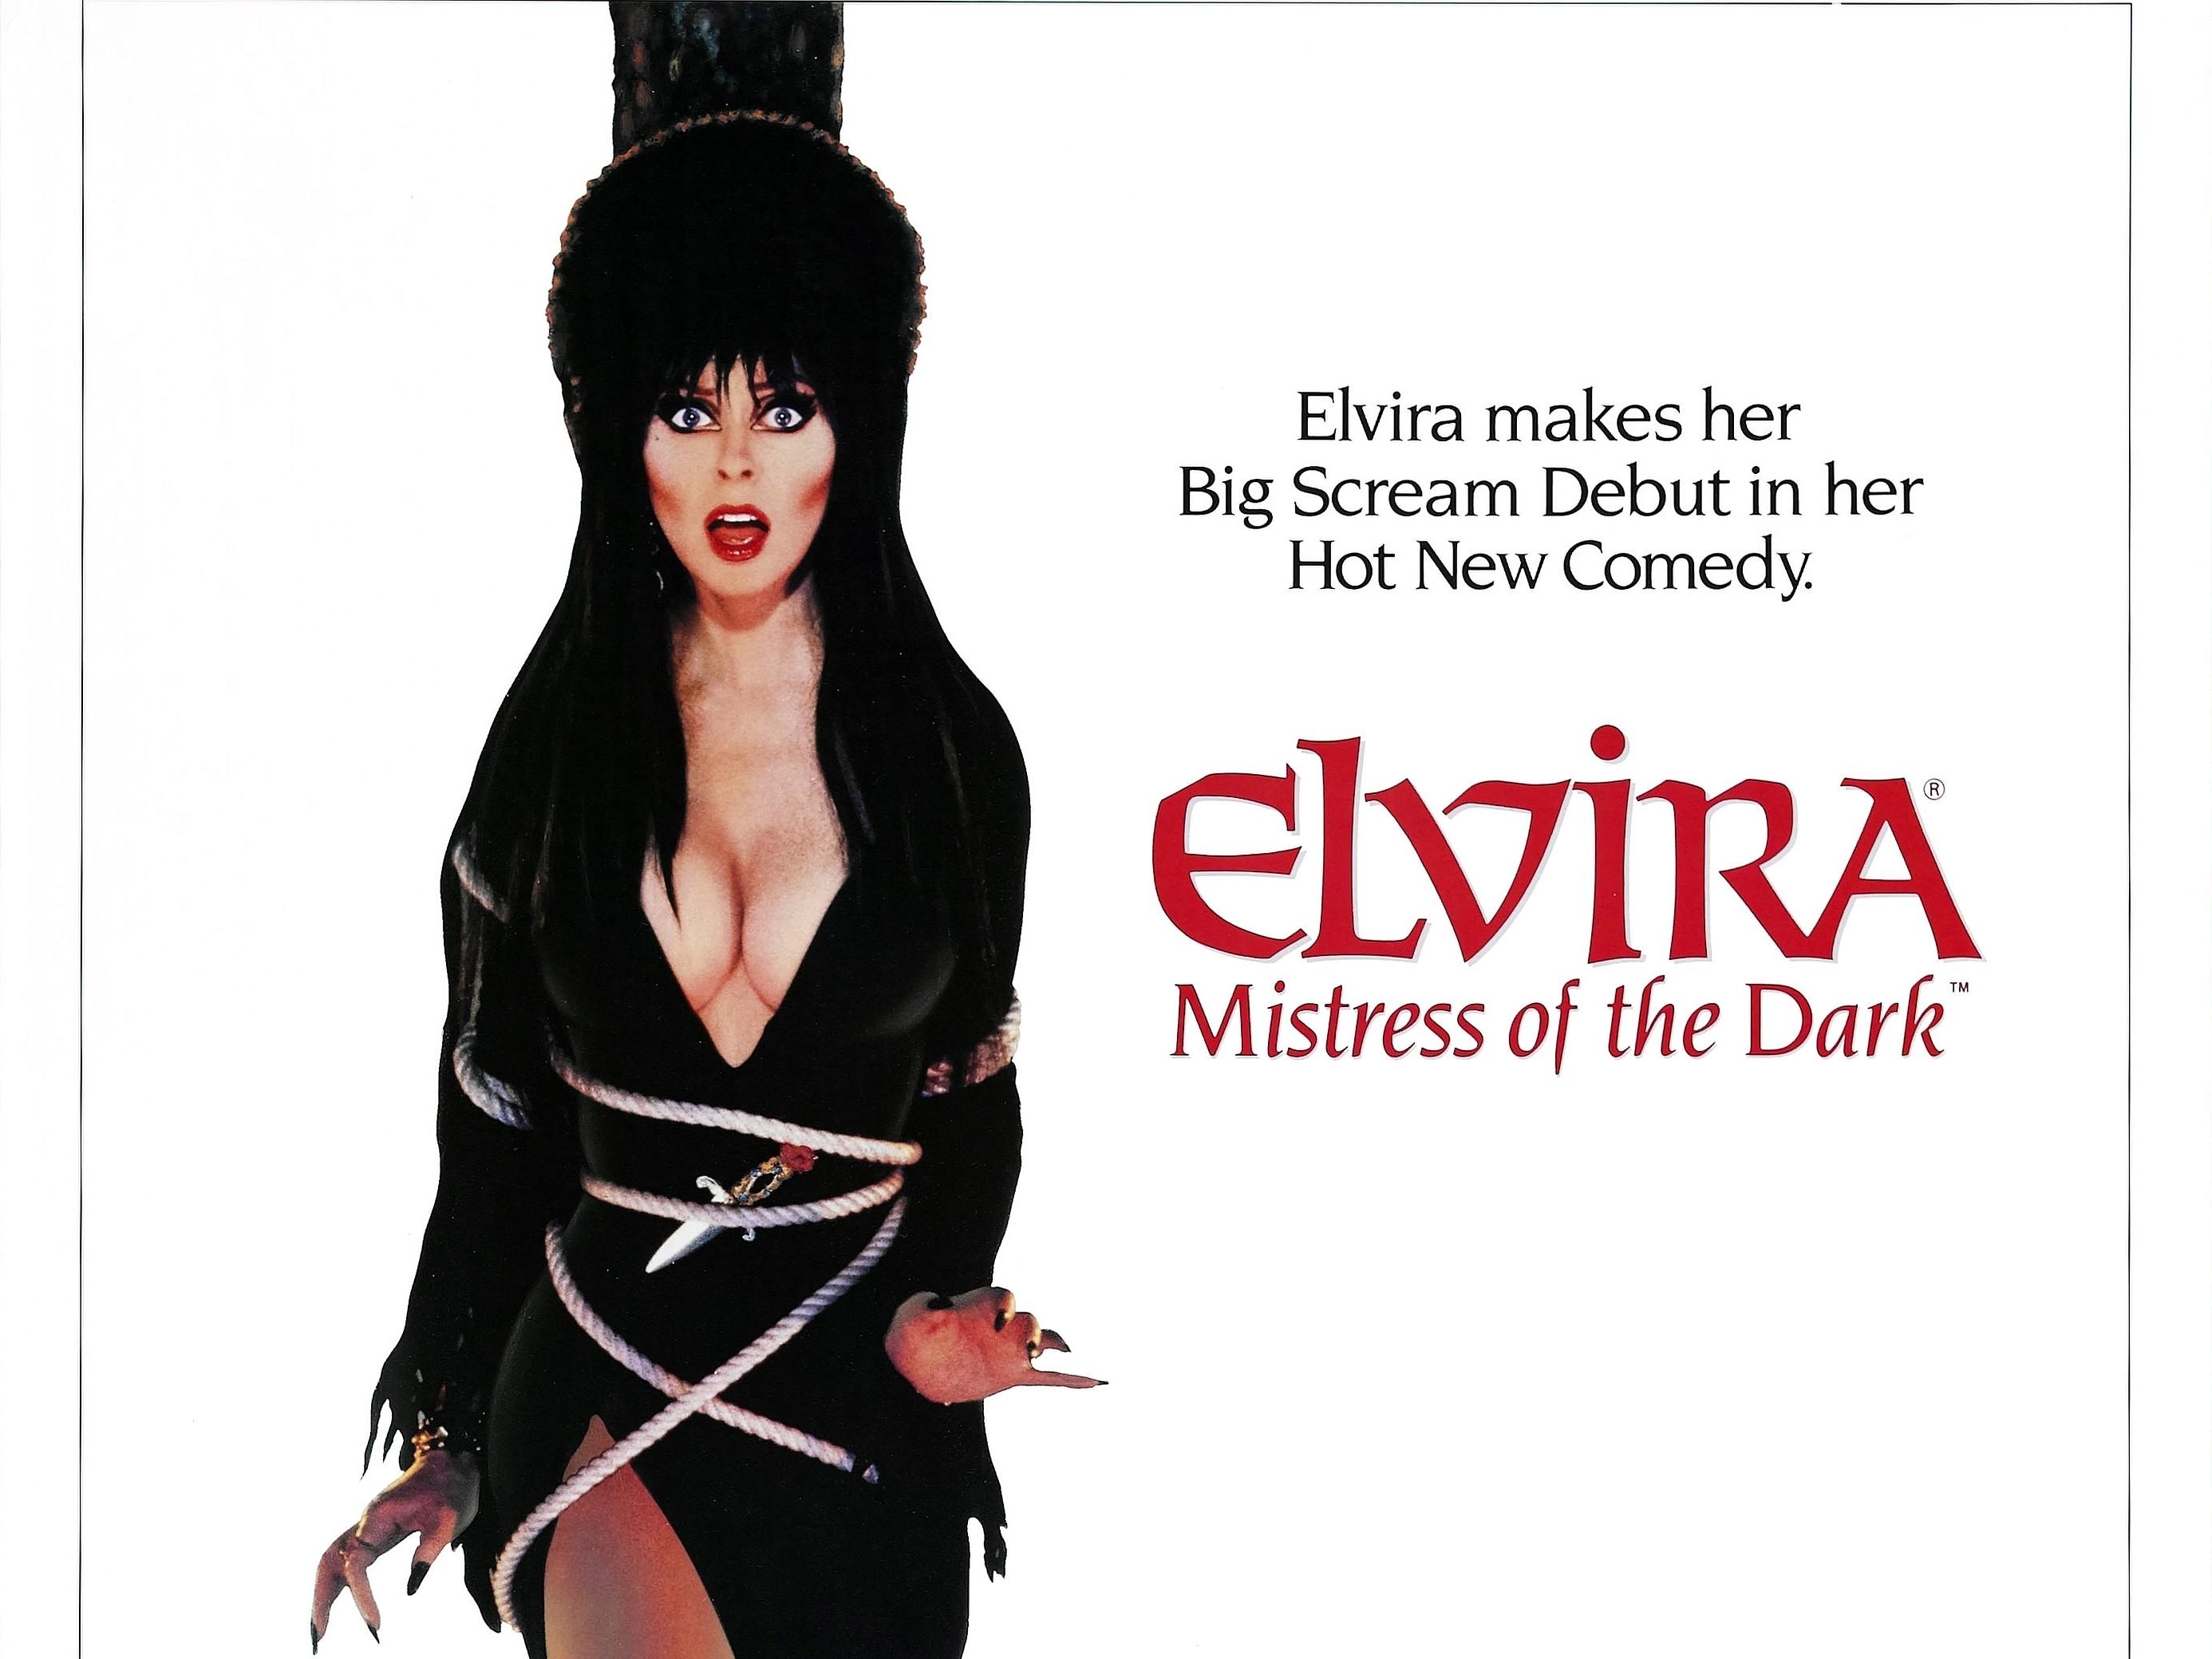 1 Elvira: Mistress Of The Dark HD Wallpapers   Backgrounds – Wallpaper Abyss